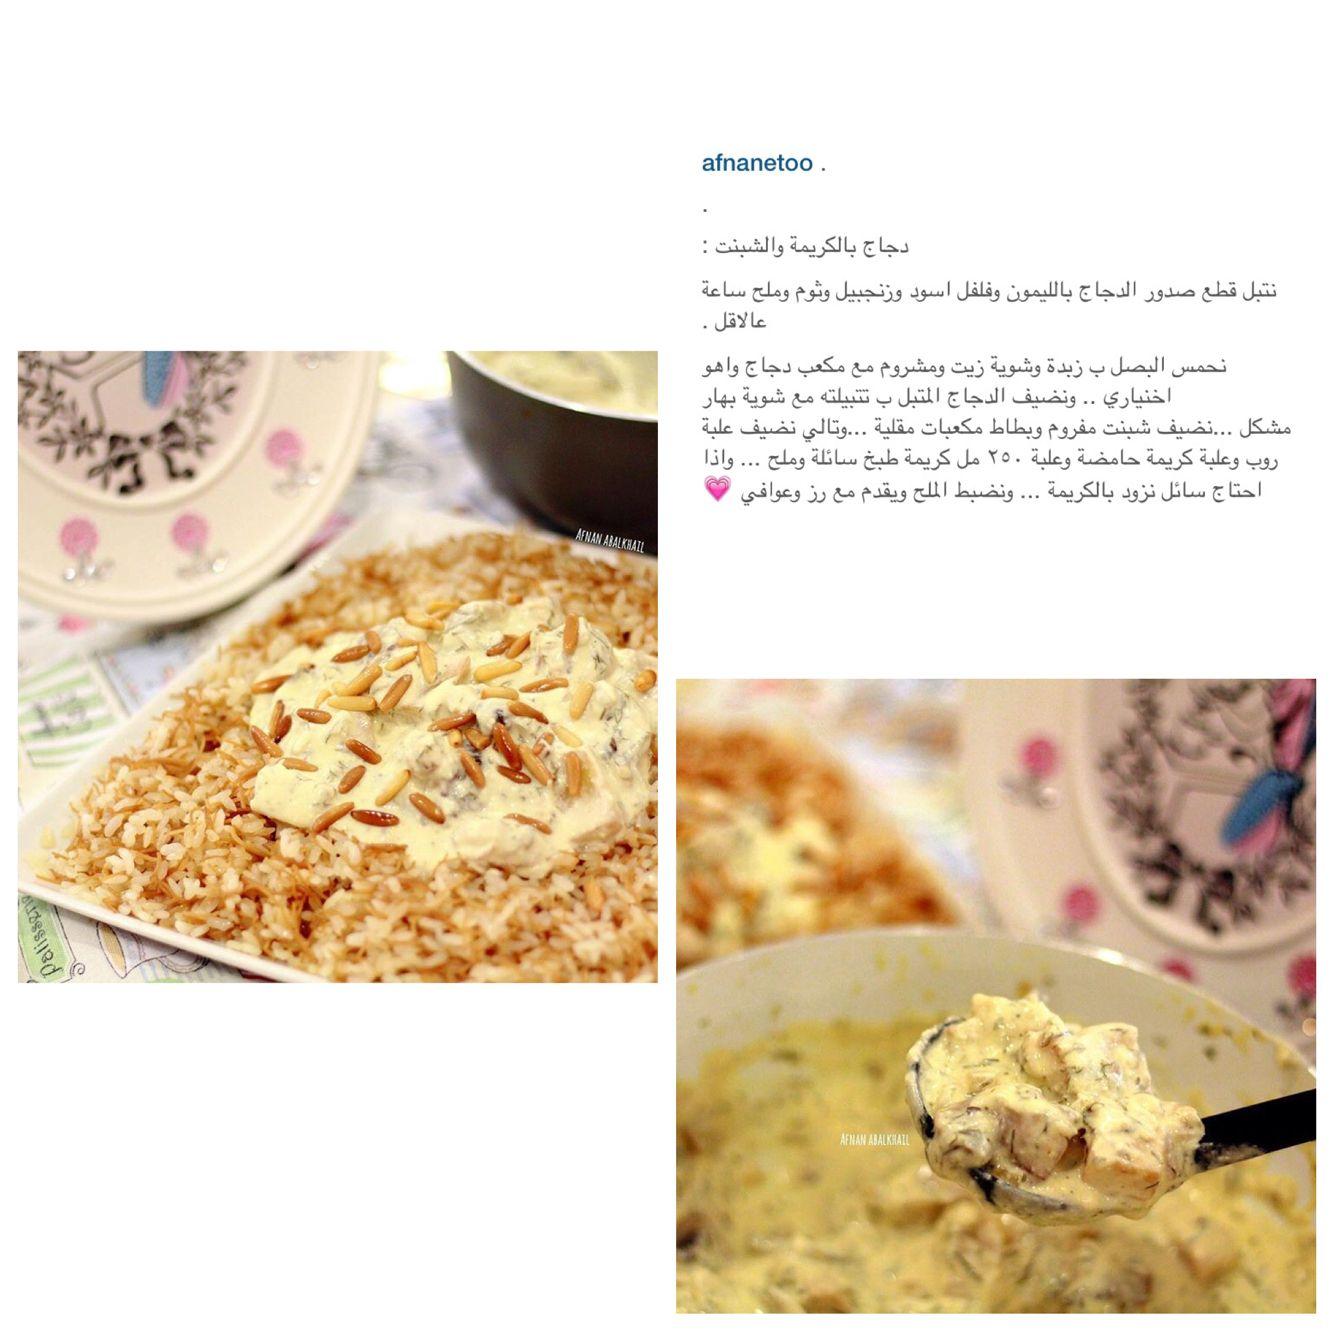 دجاج بالكريمة والشبنت Food Recipes New Recipes